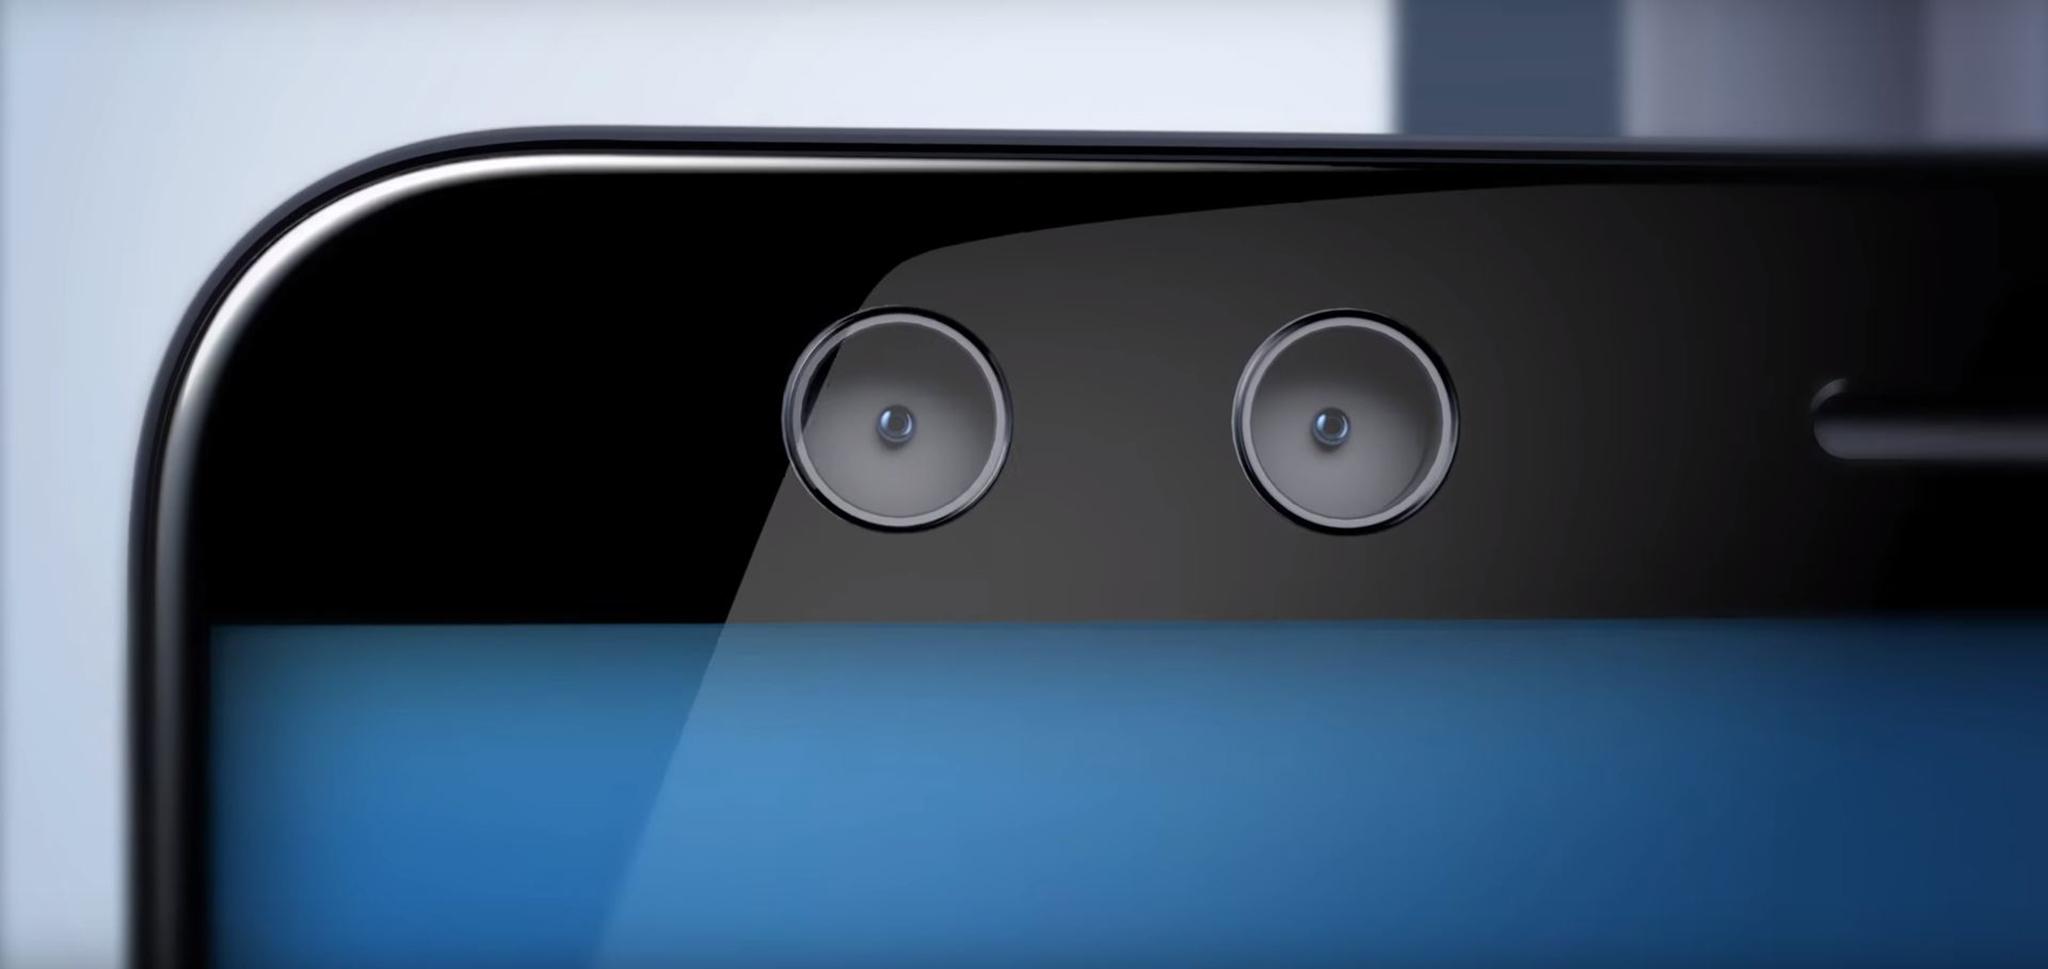 HTC U12+ Selfie camera.JPG